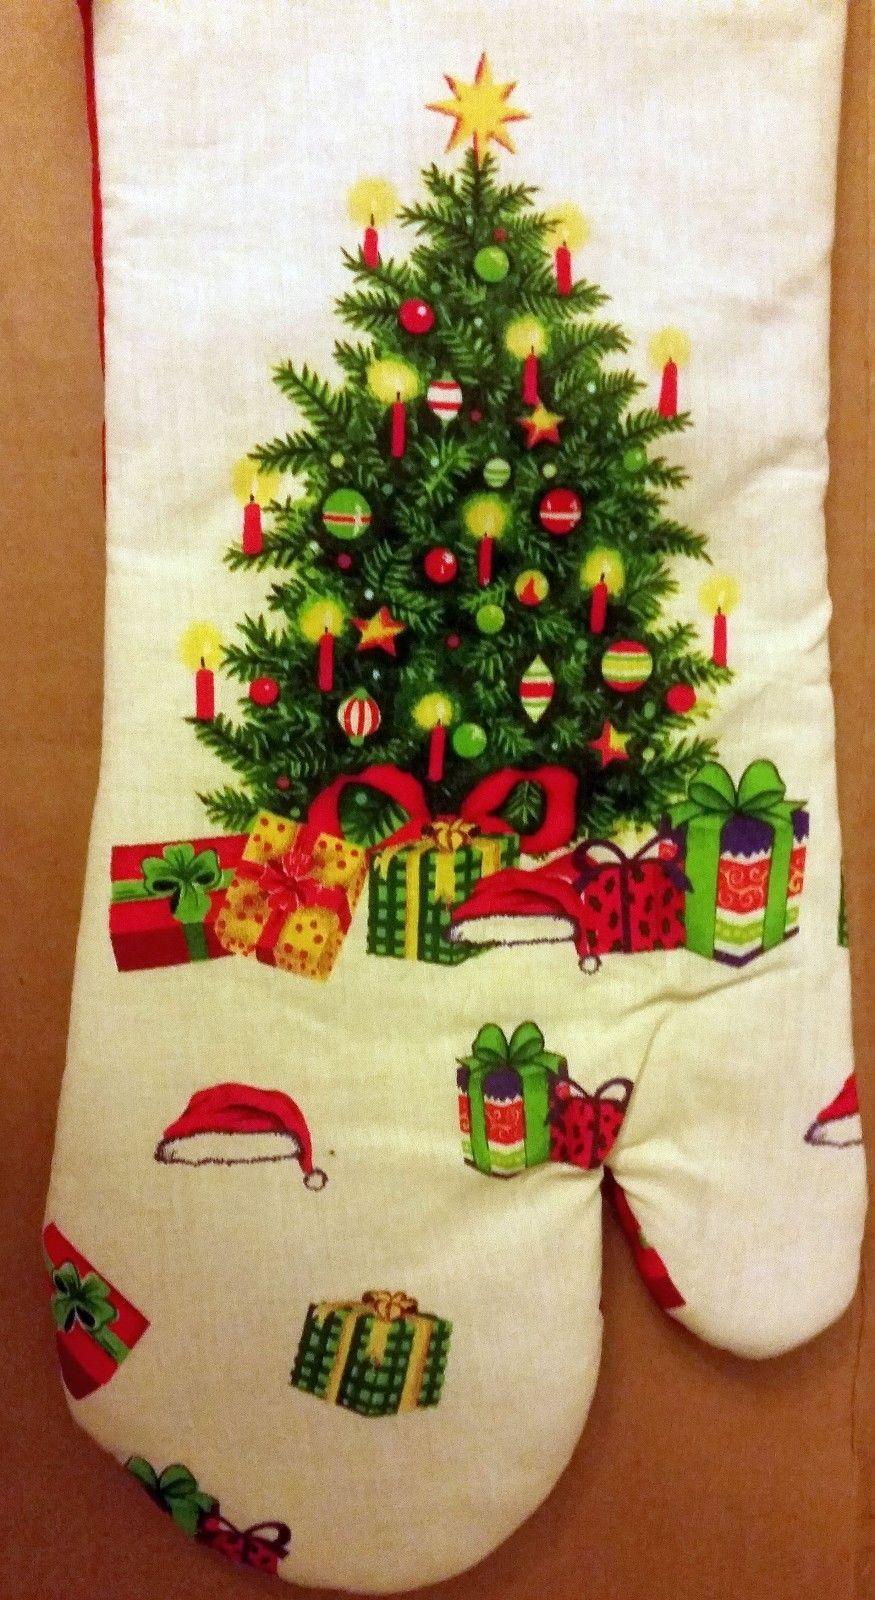 "Oversized Printed Kitchen 14.5"" Oven Mitt, WINTER, THE CHRISTMAS TREE"